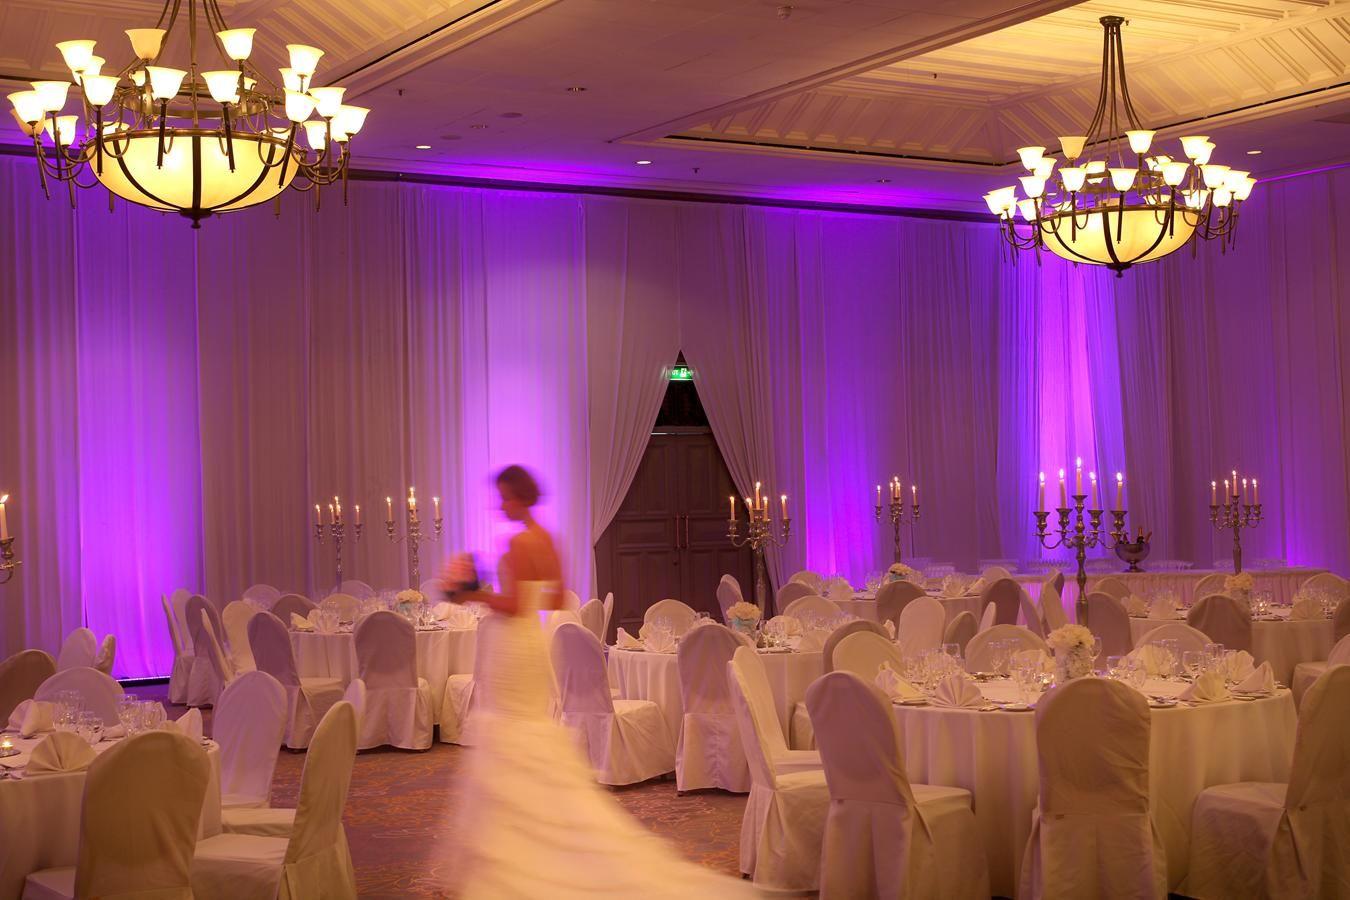 Ledra ballroom is the biggest pillar free ballroom weddings hilton ledra ballroom is the biggest pillar free ballroom weddings hilton nicosia cyprus junglespirit Choice Image